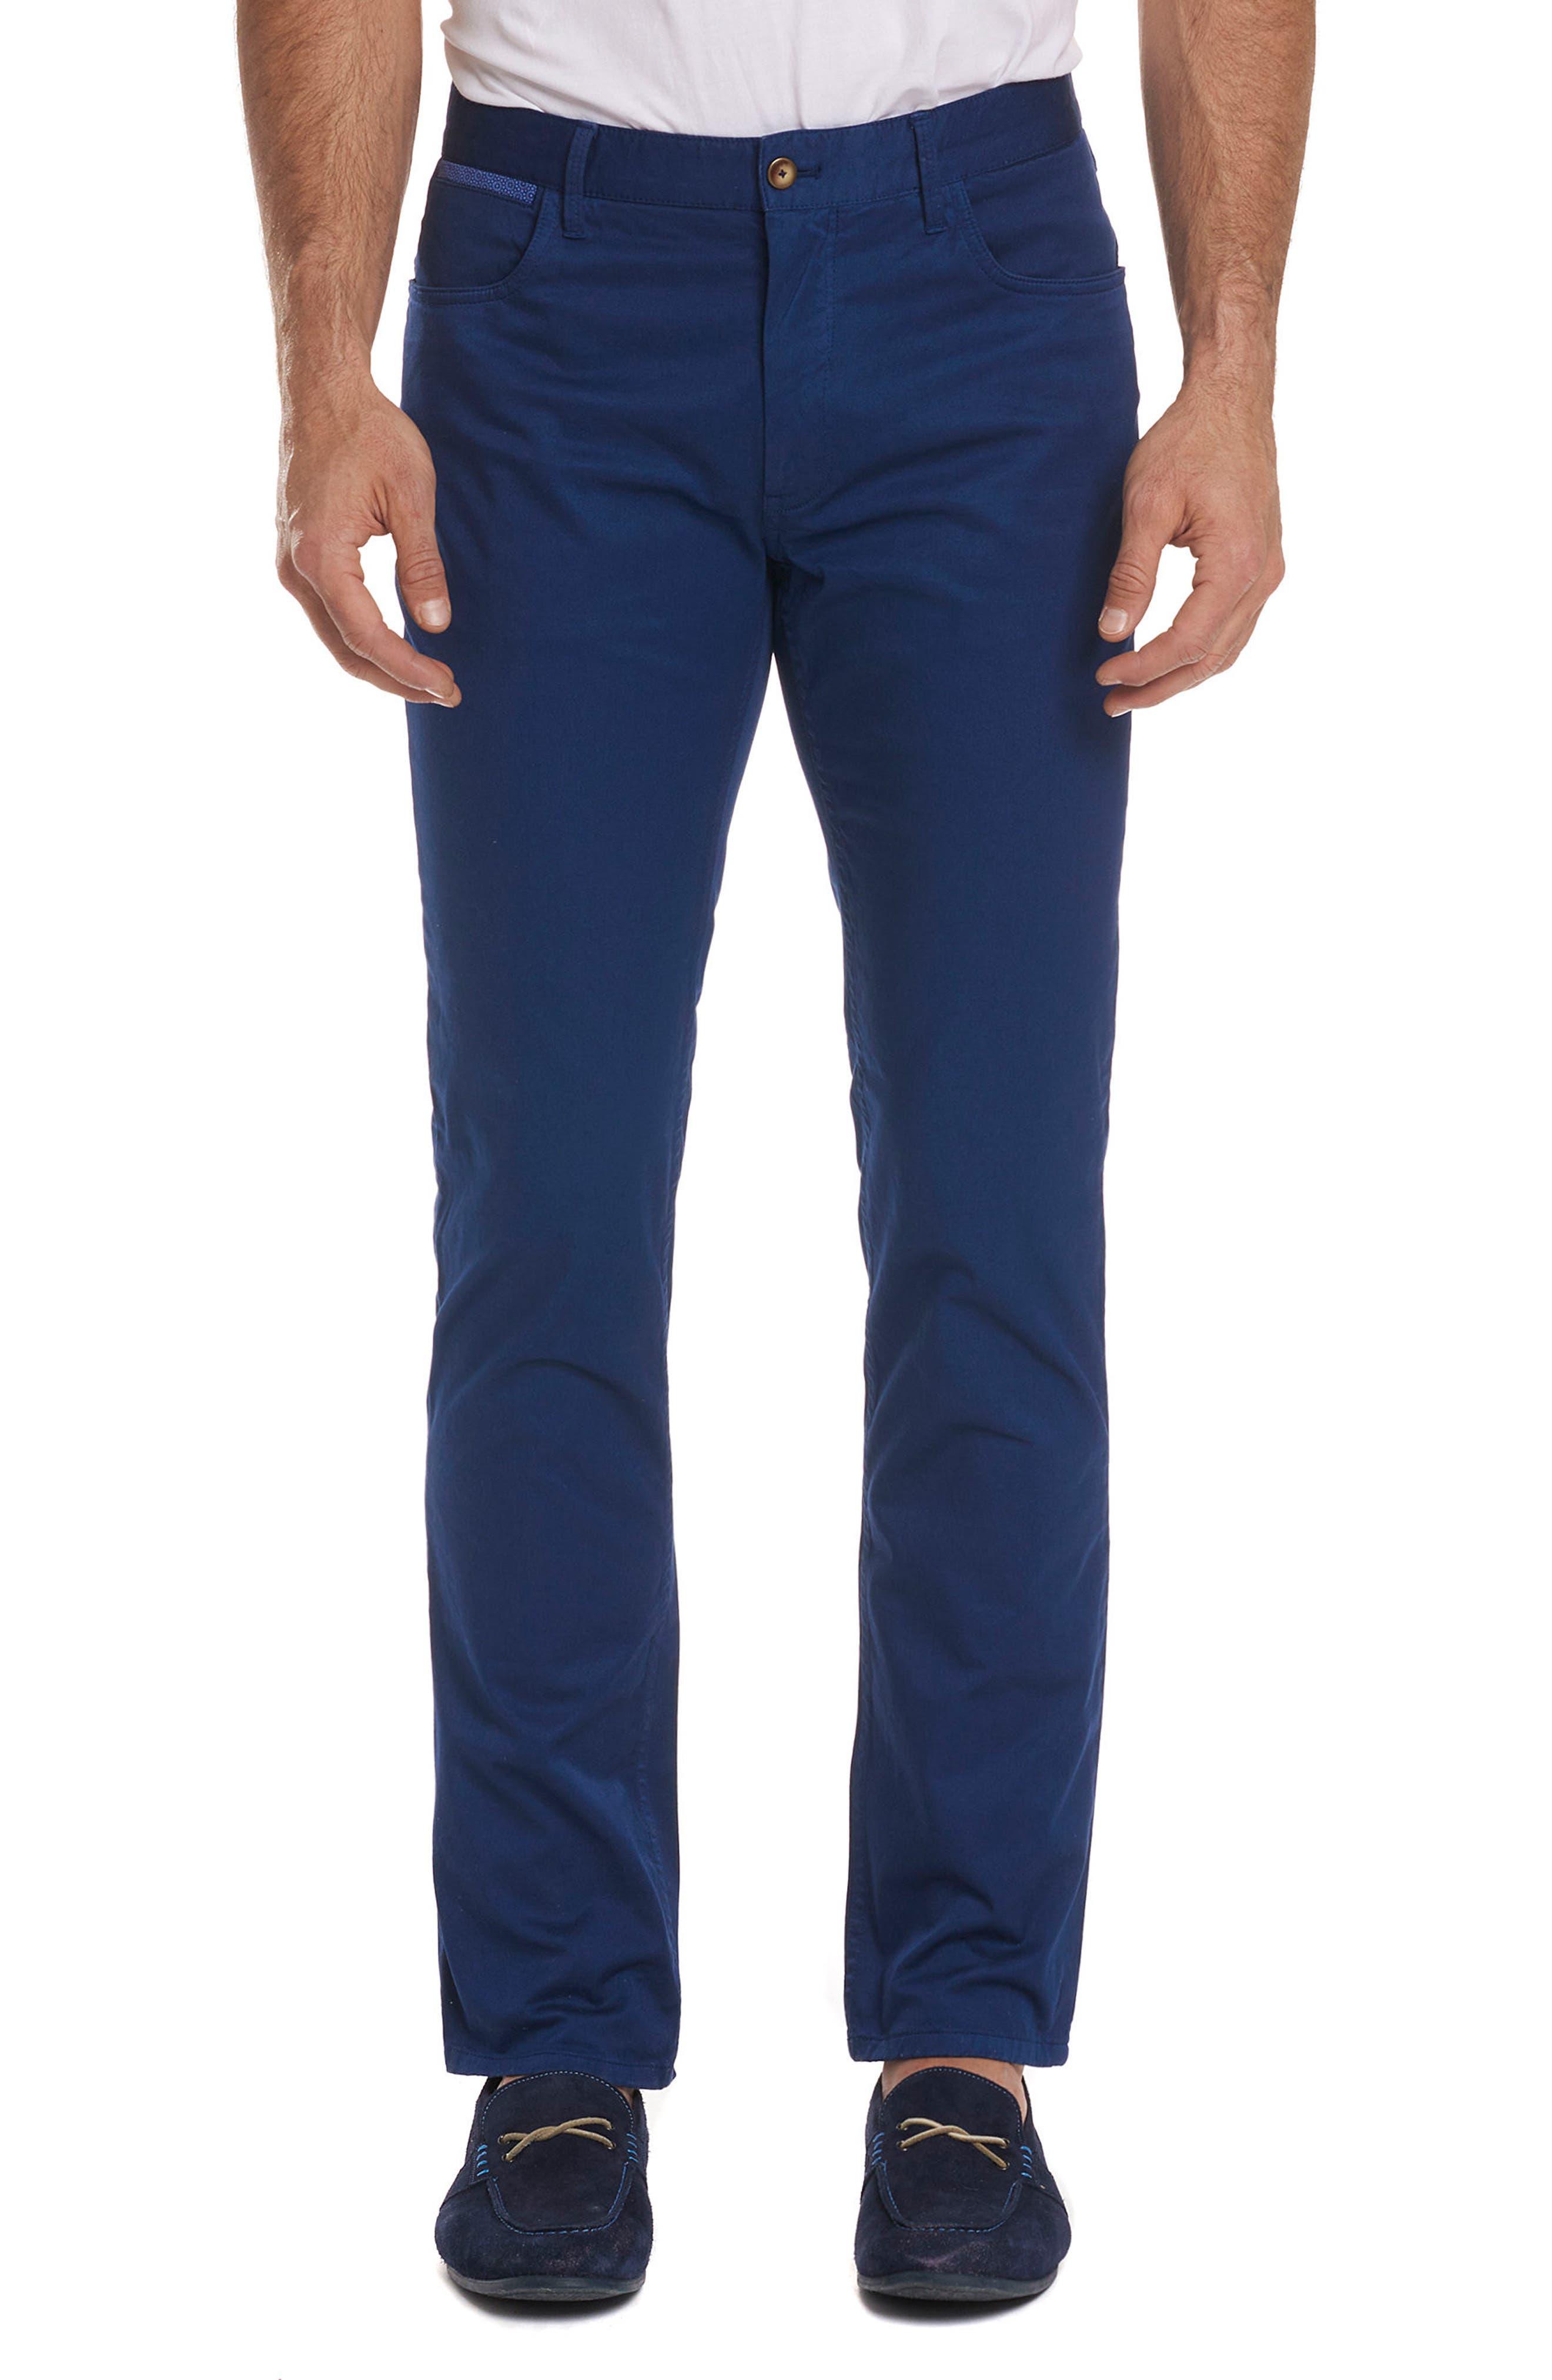 Marti Tailored Fit Pants,                         Main,                         color, BLUE